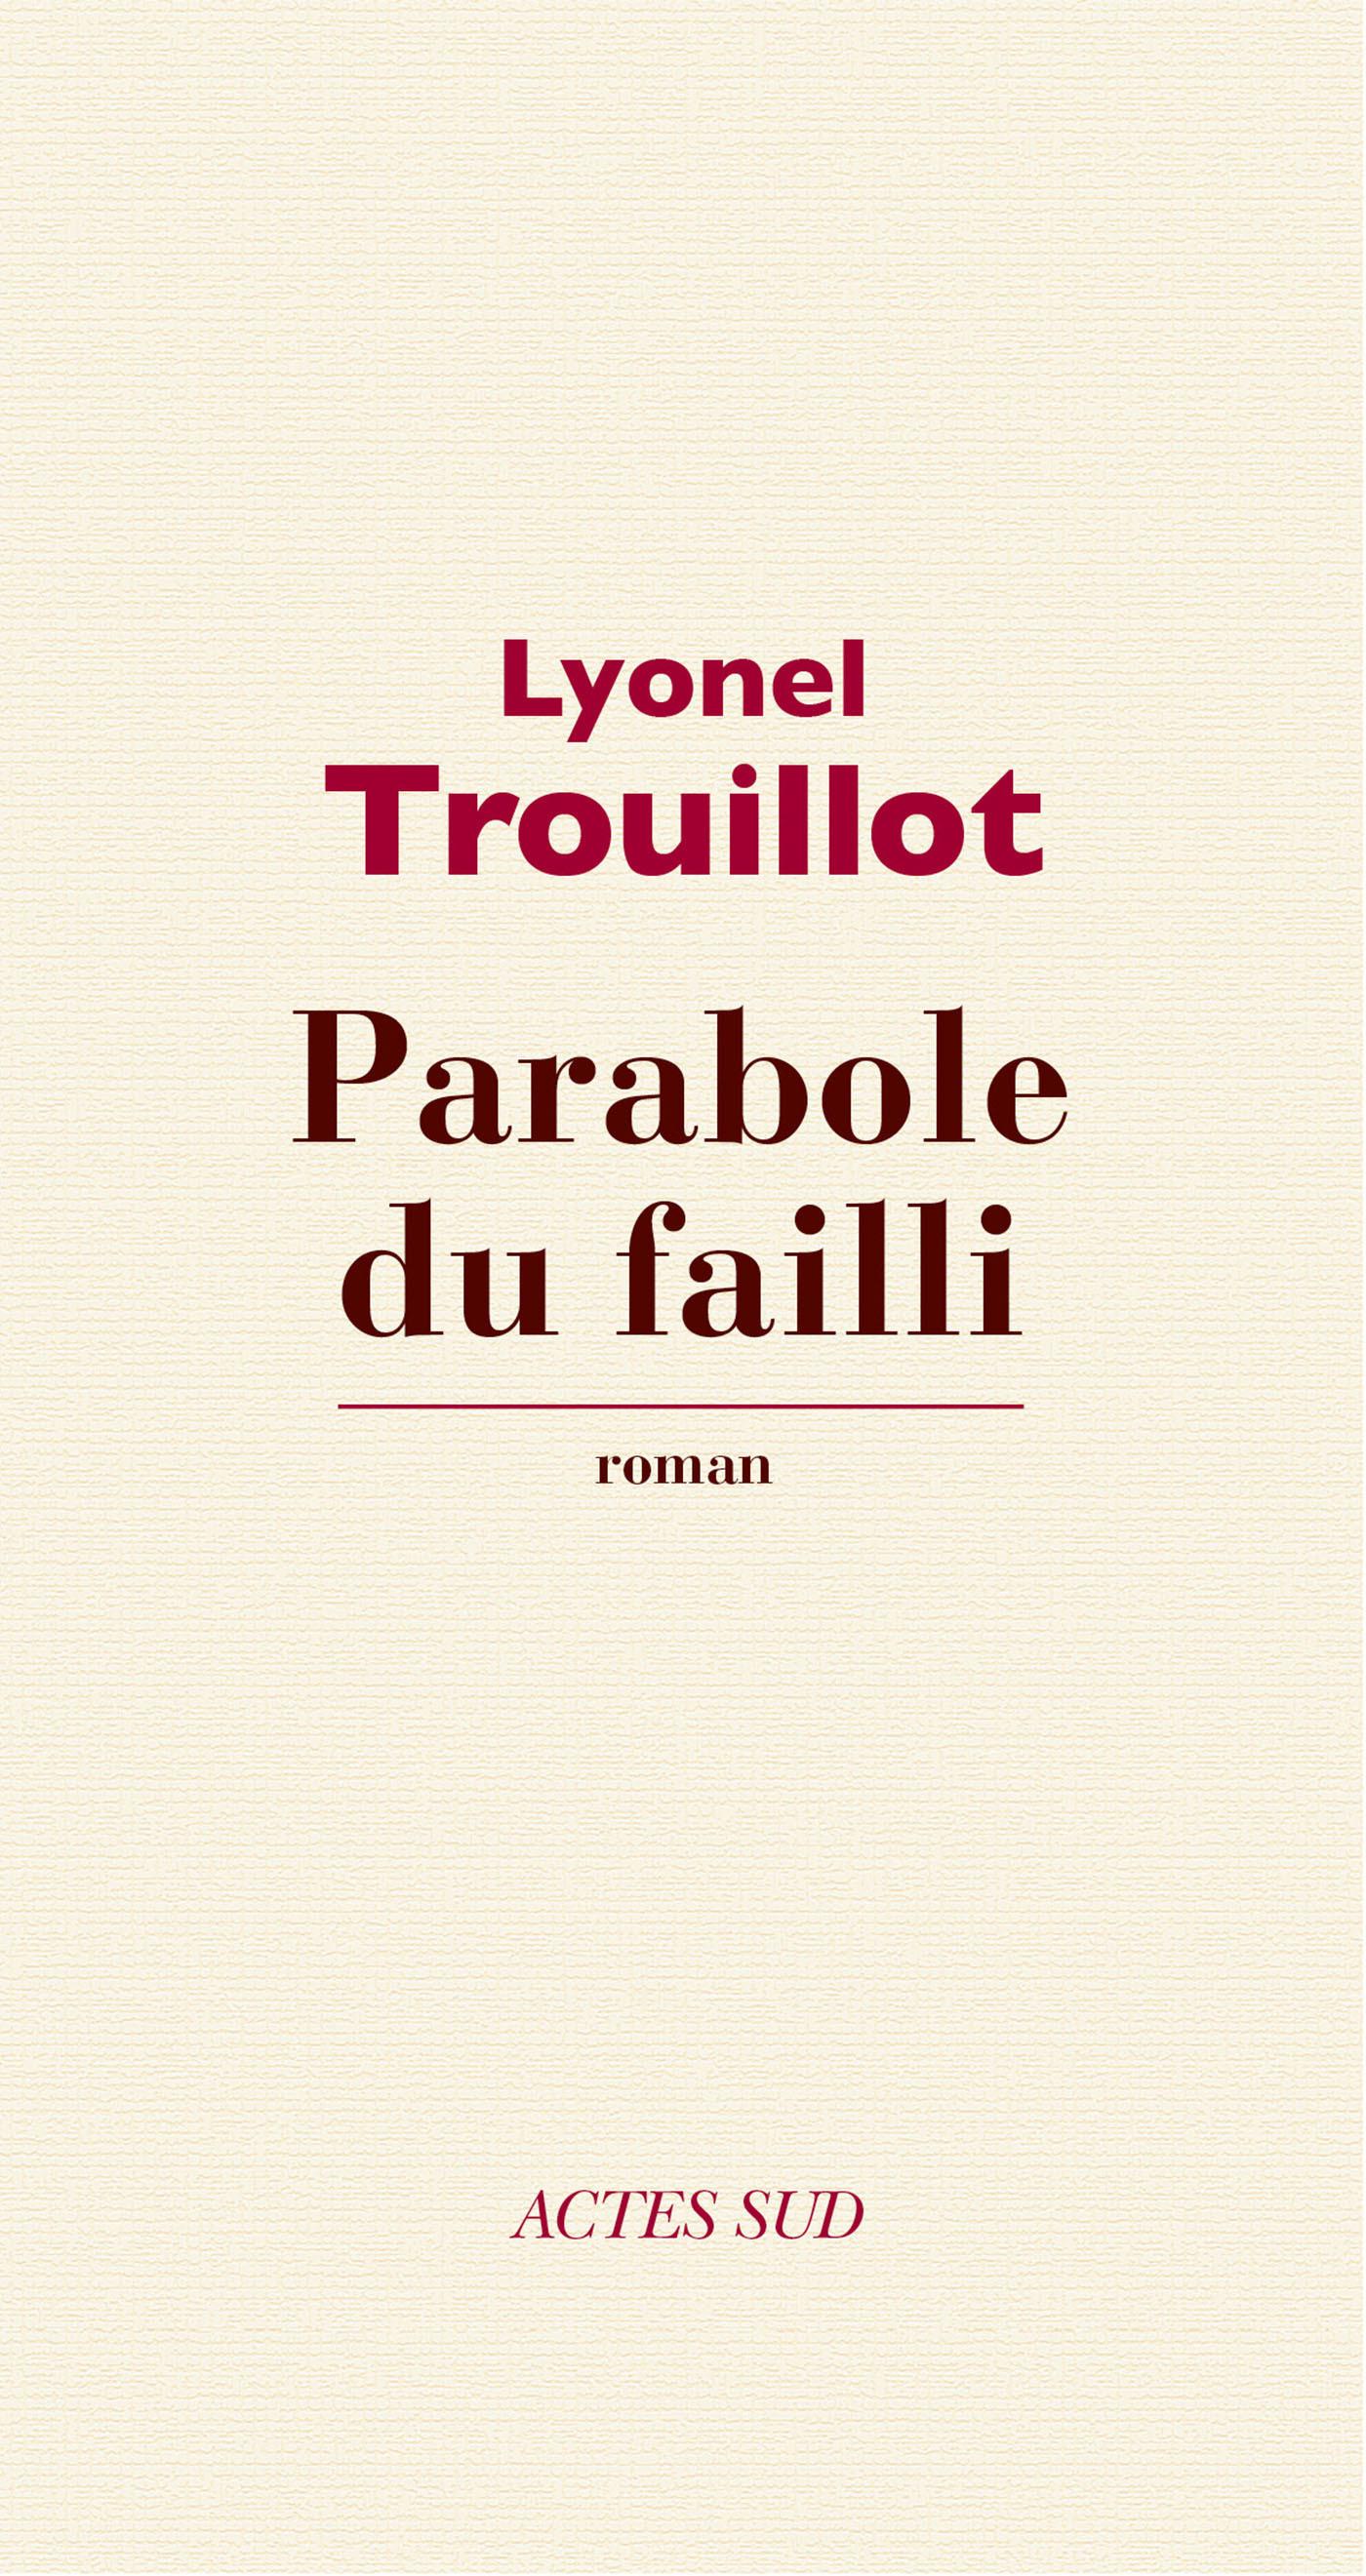 Parabole du failli | Trouillot, Lyonel